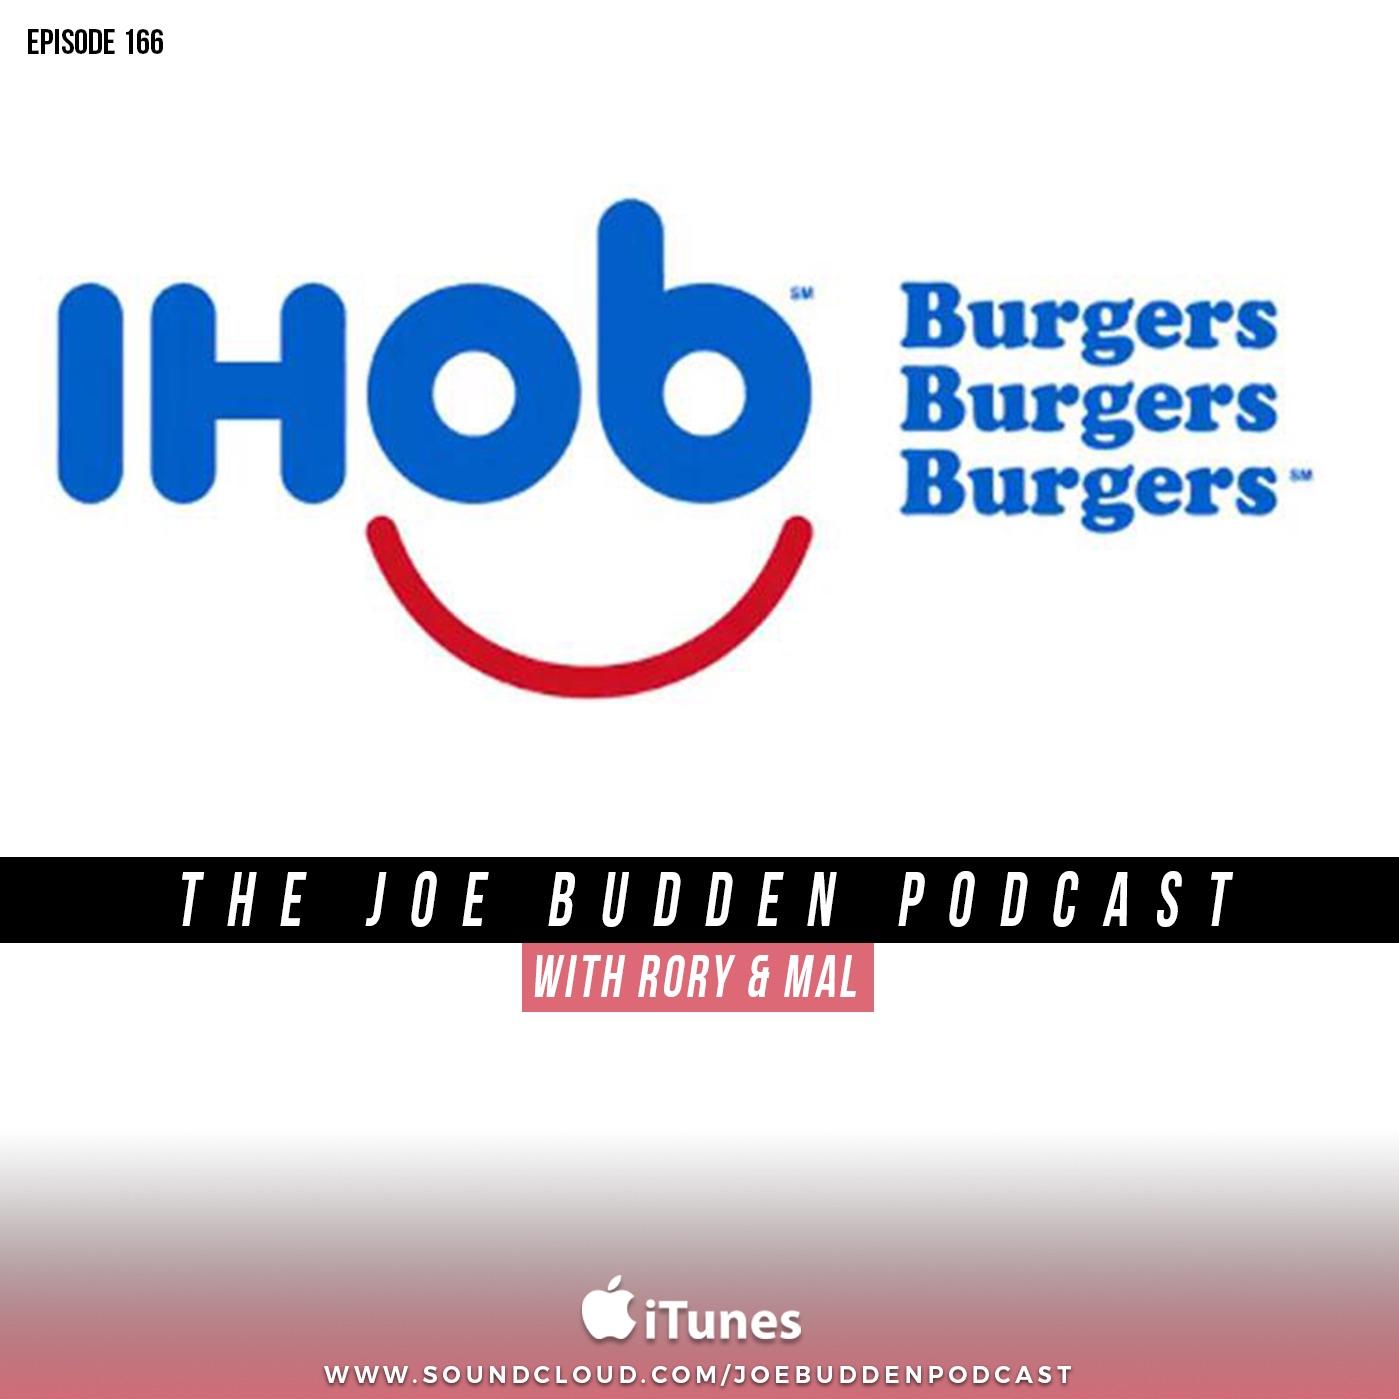 The Joe Budden Podcast with Rory & Mal | Podbay